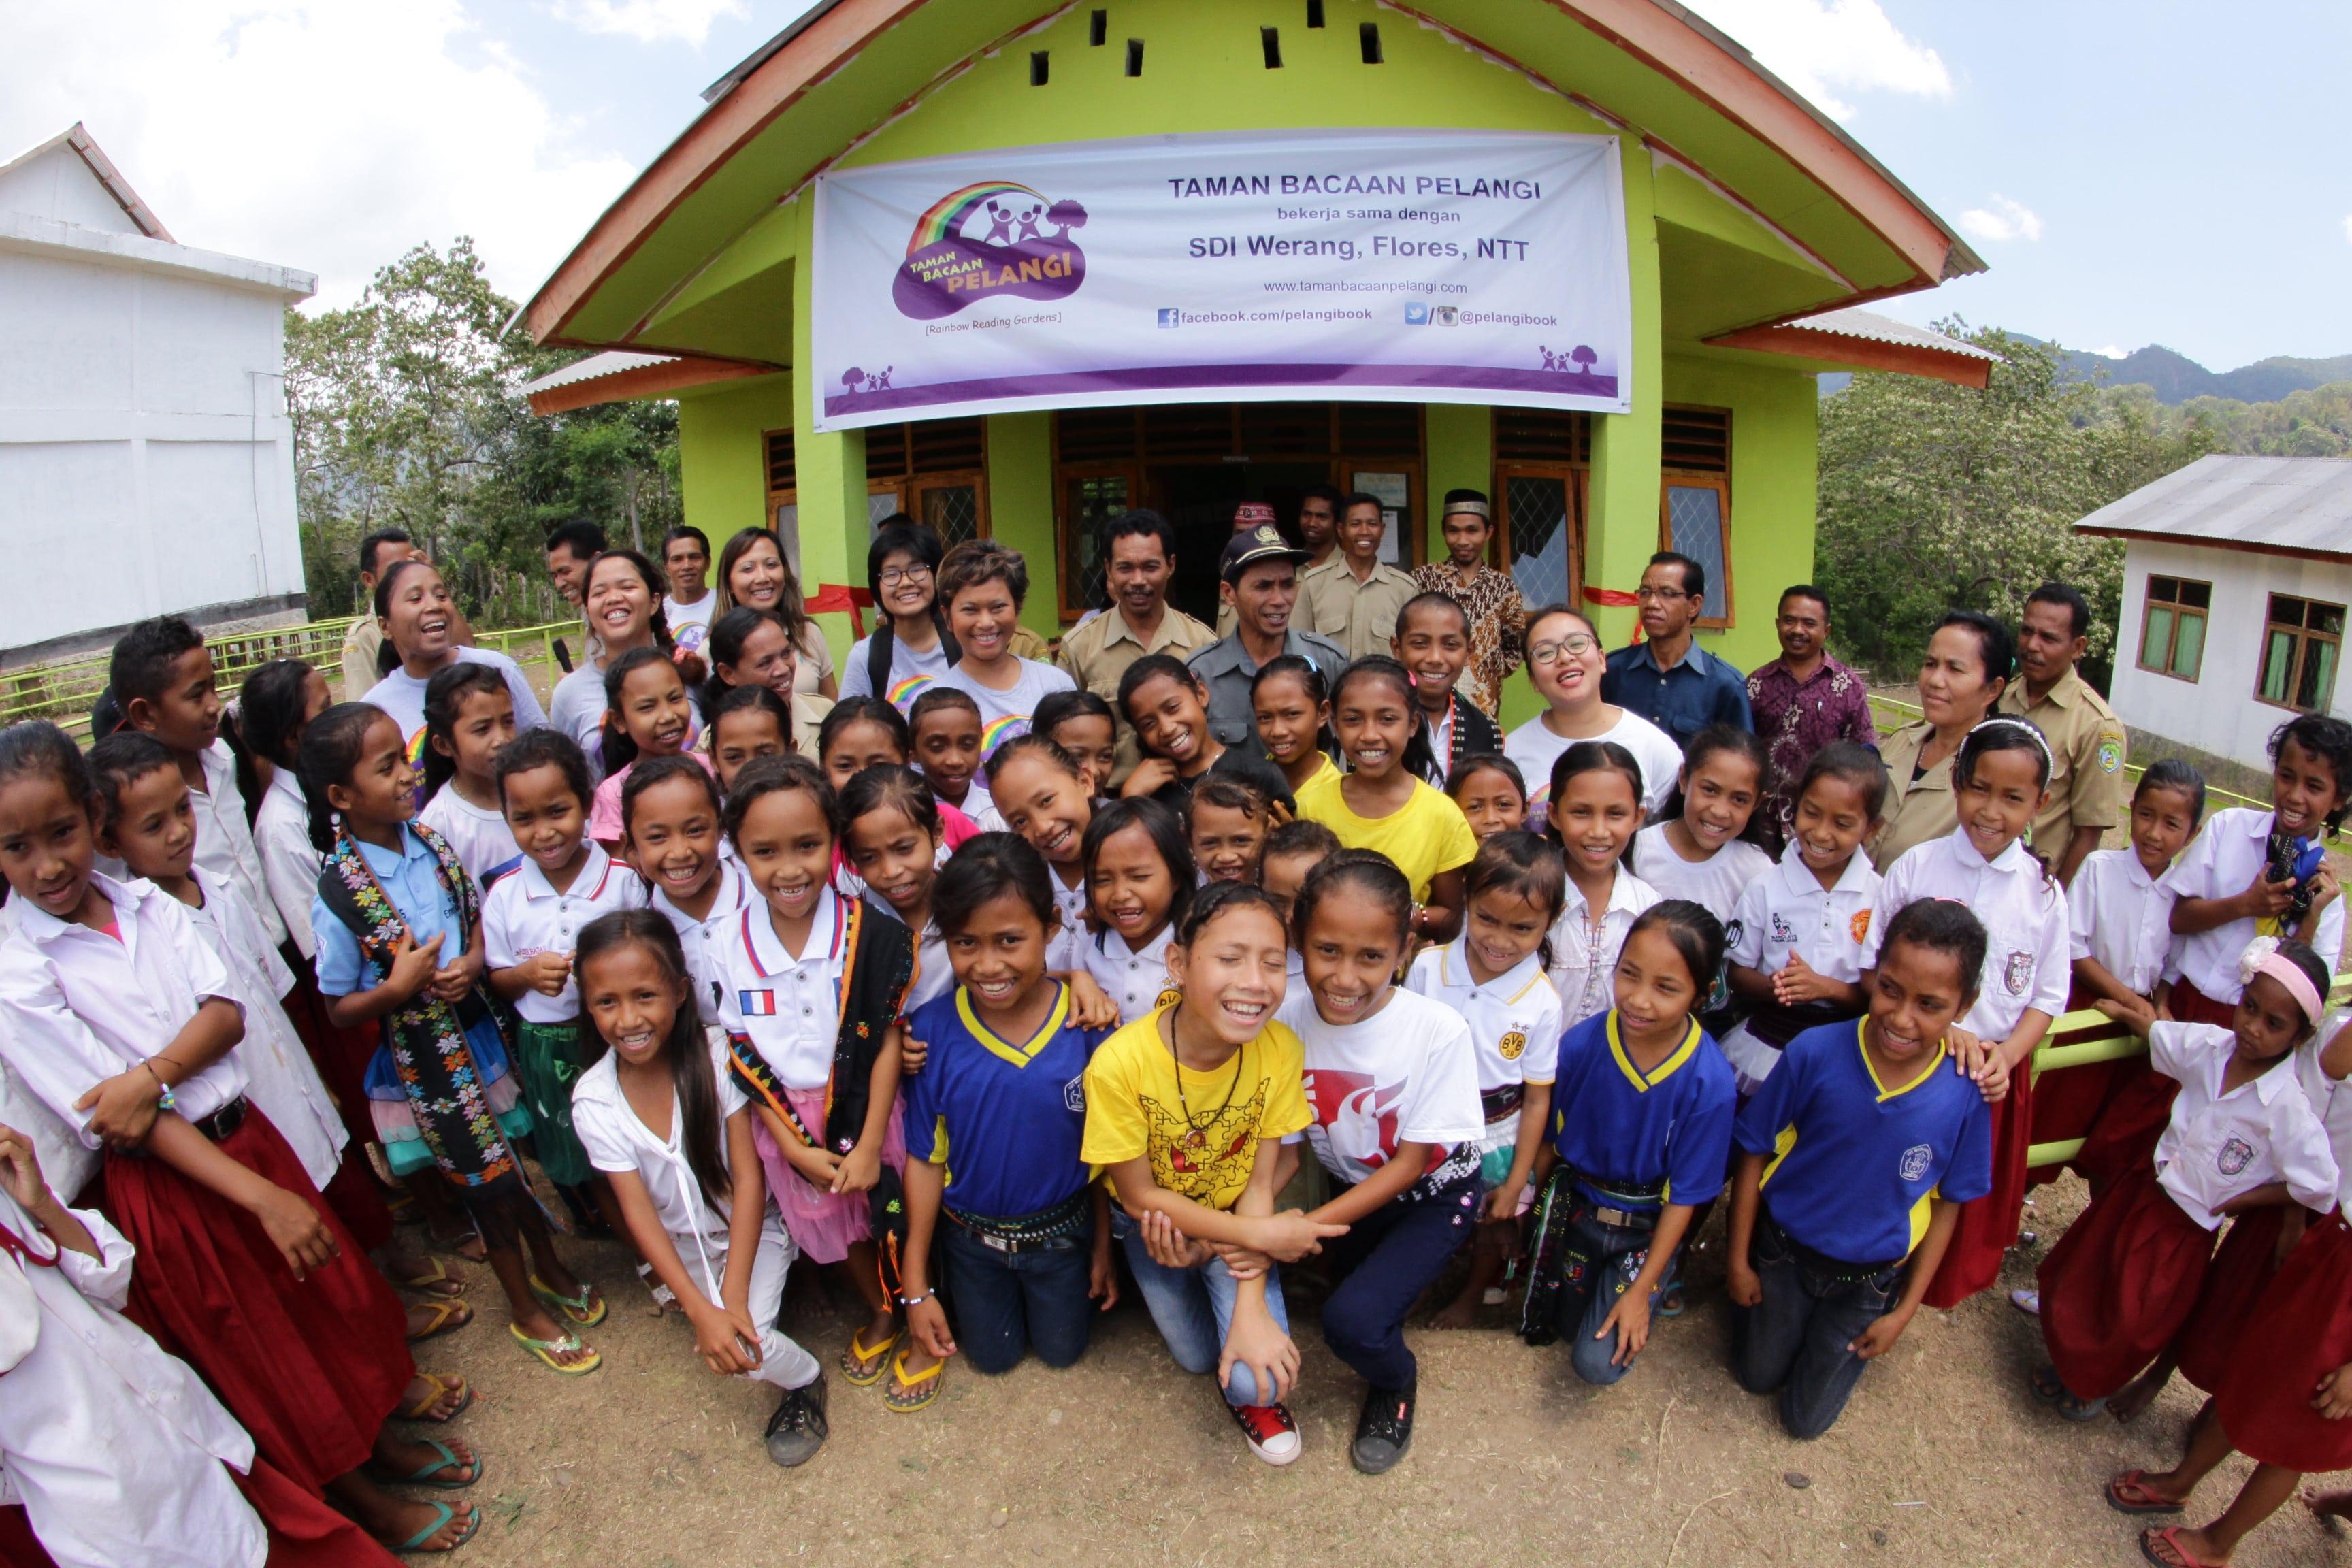 Peresmian Perpustakaan Taman Bacaan Pelangi ke-35 di SDI Werang, Flores